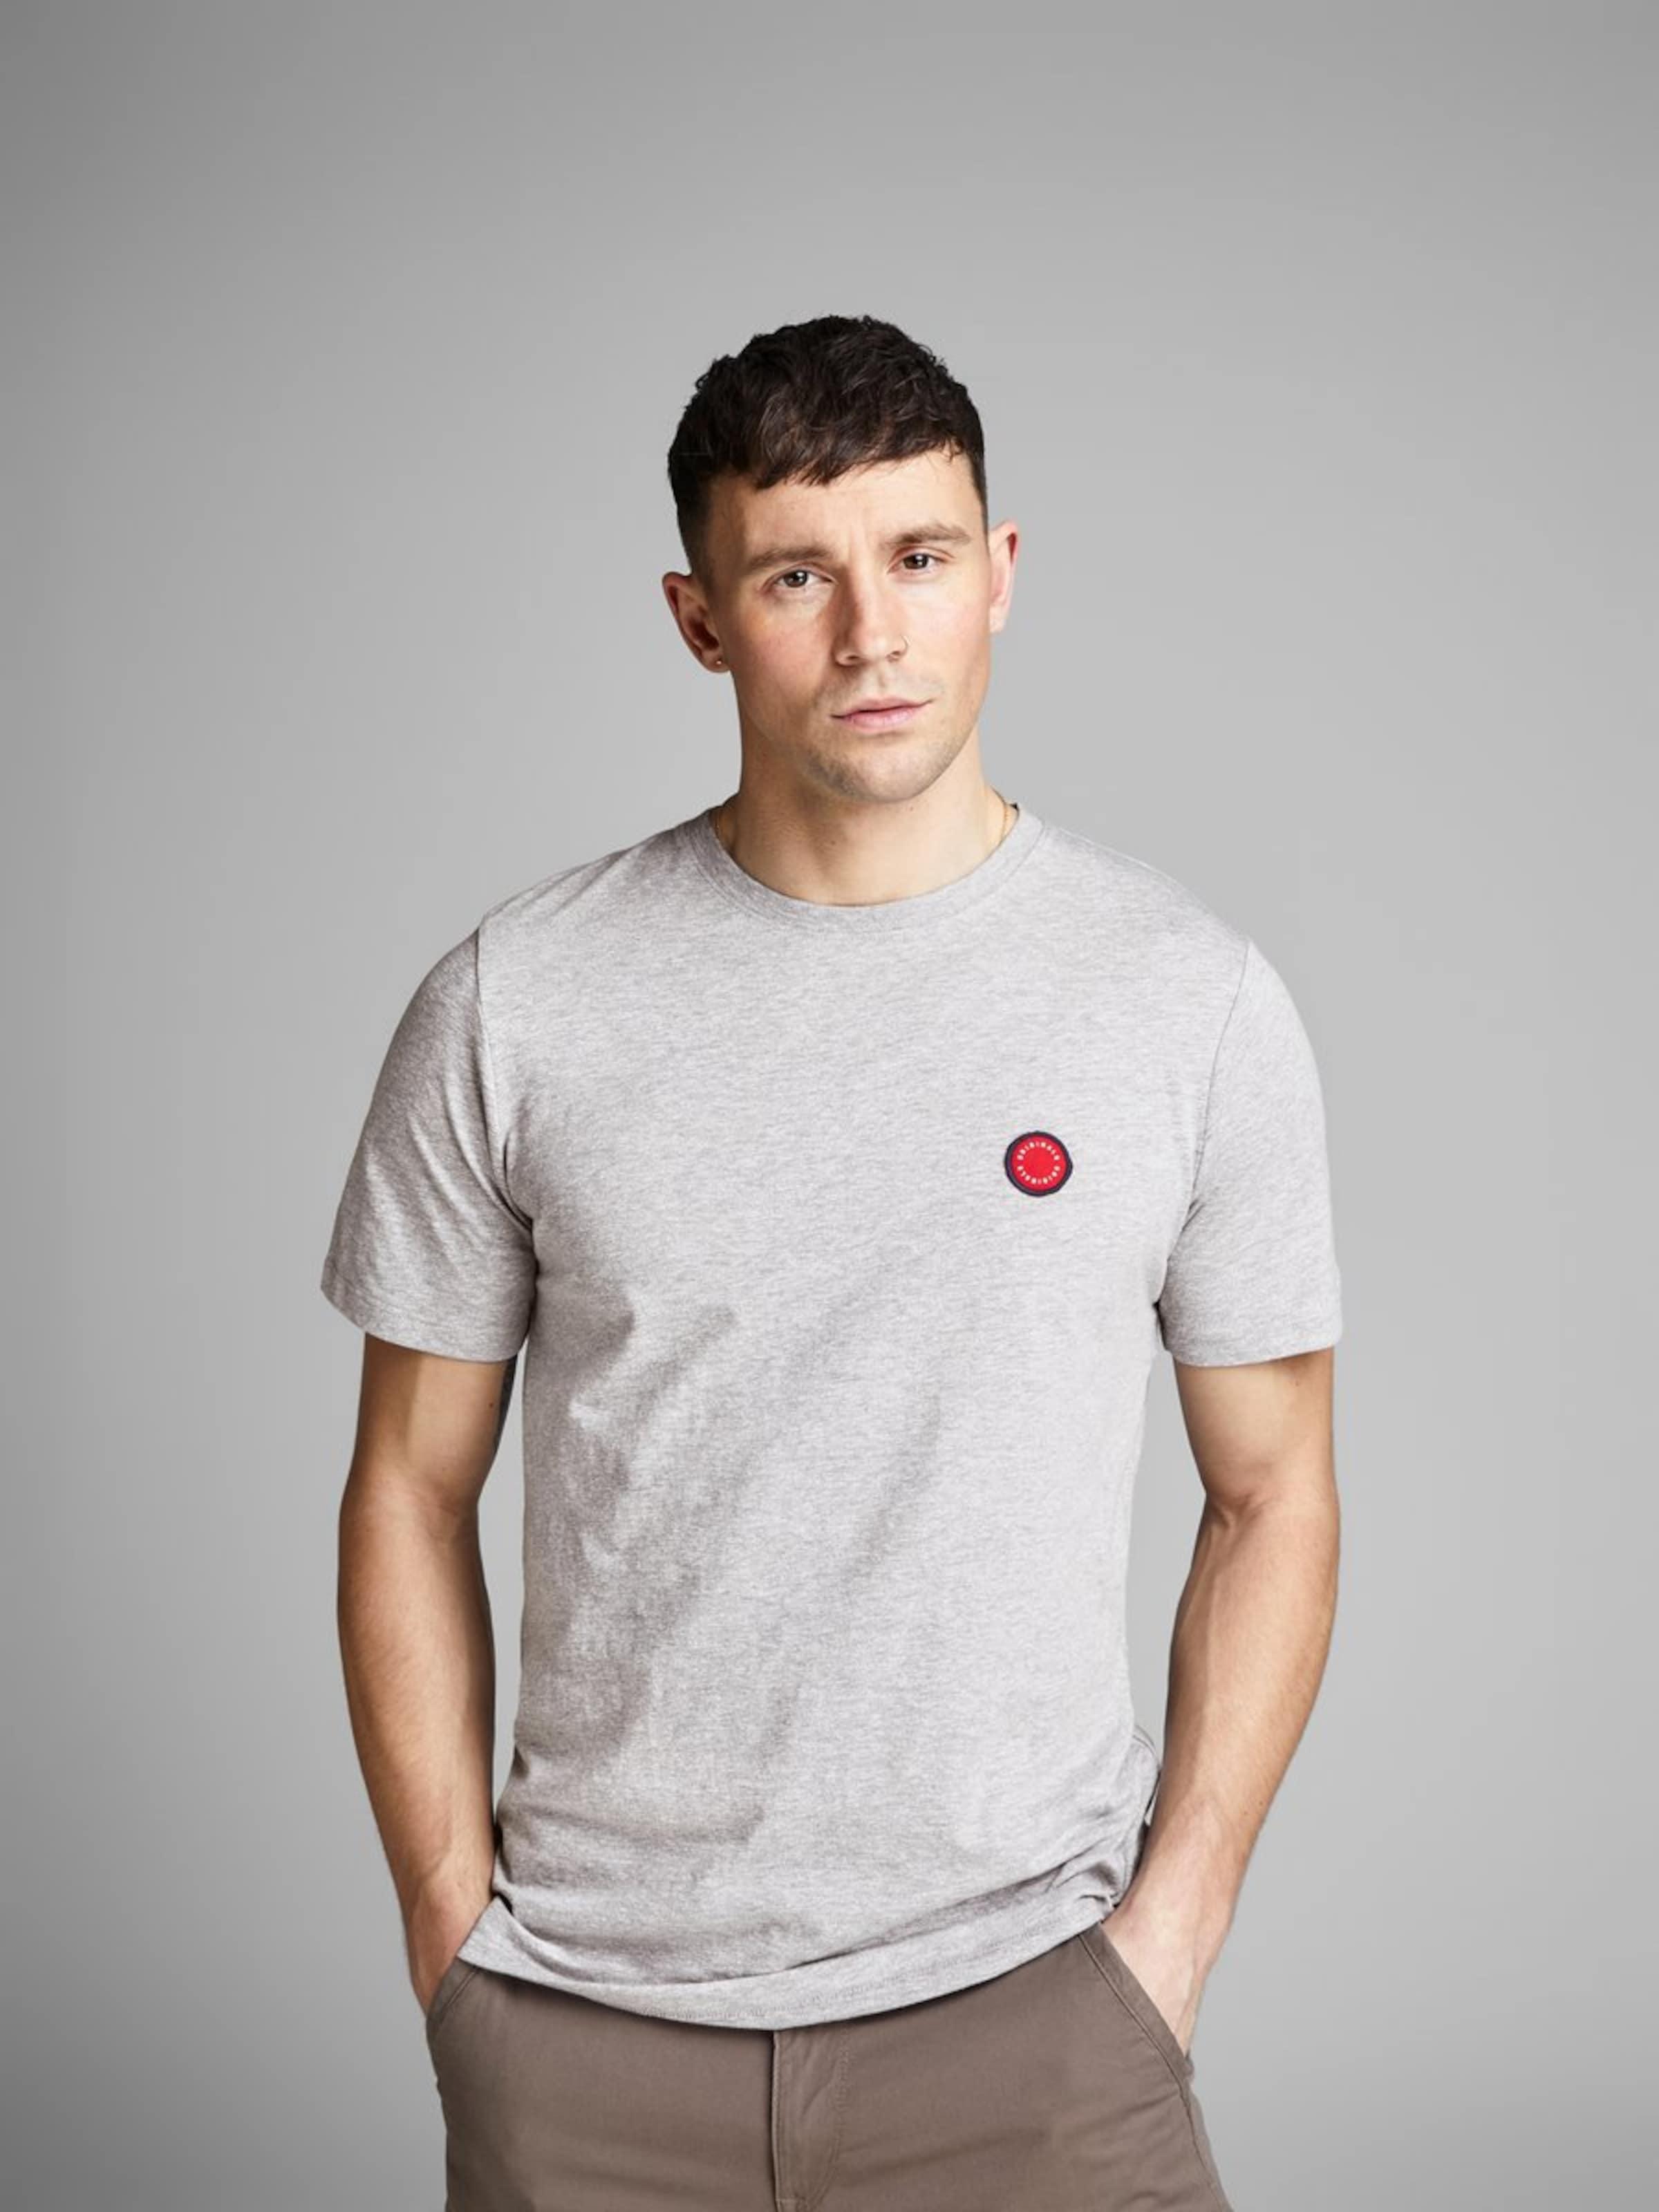 En shirt Jones Jackamp; Beige Chiné T eDH2IWYE9